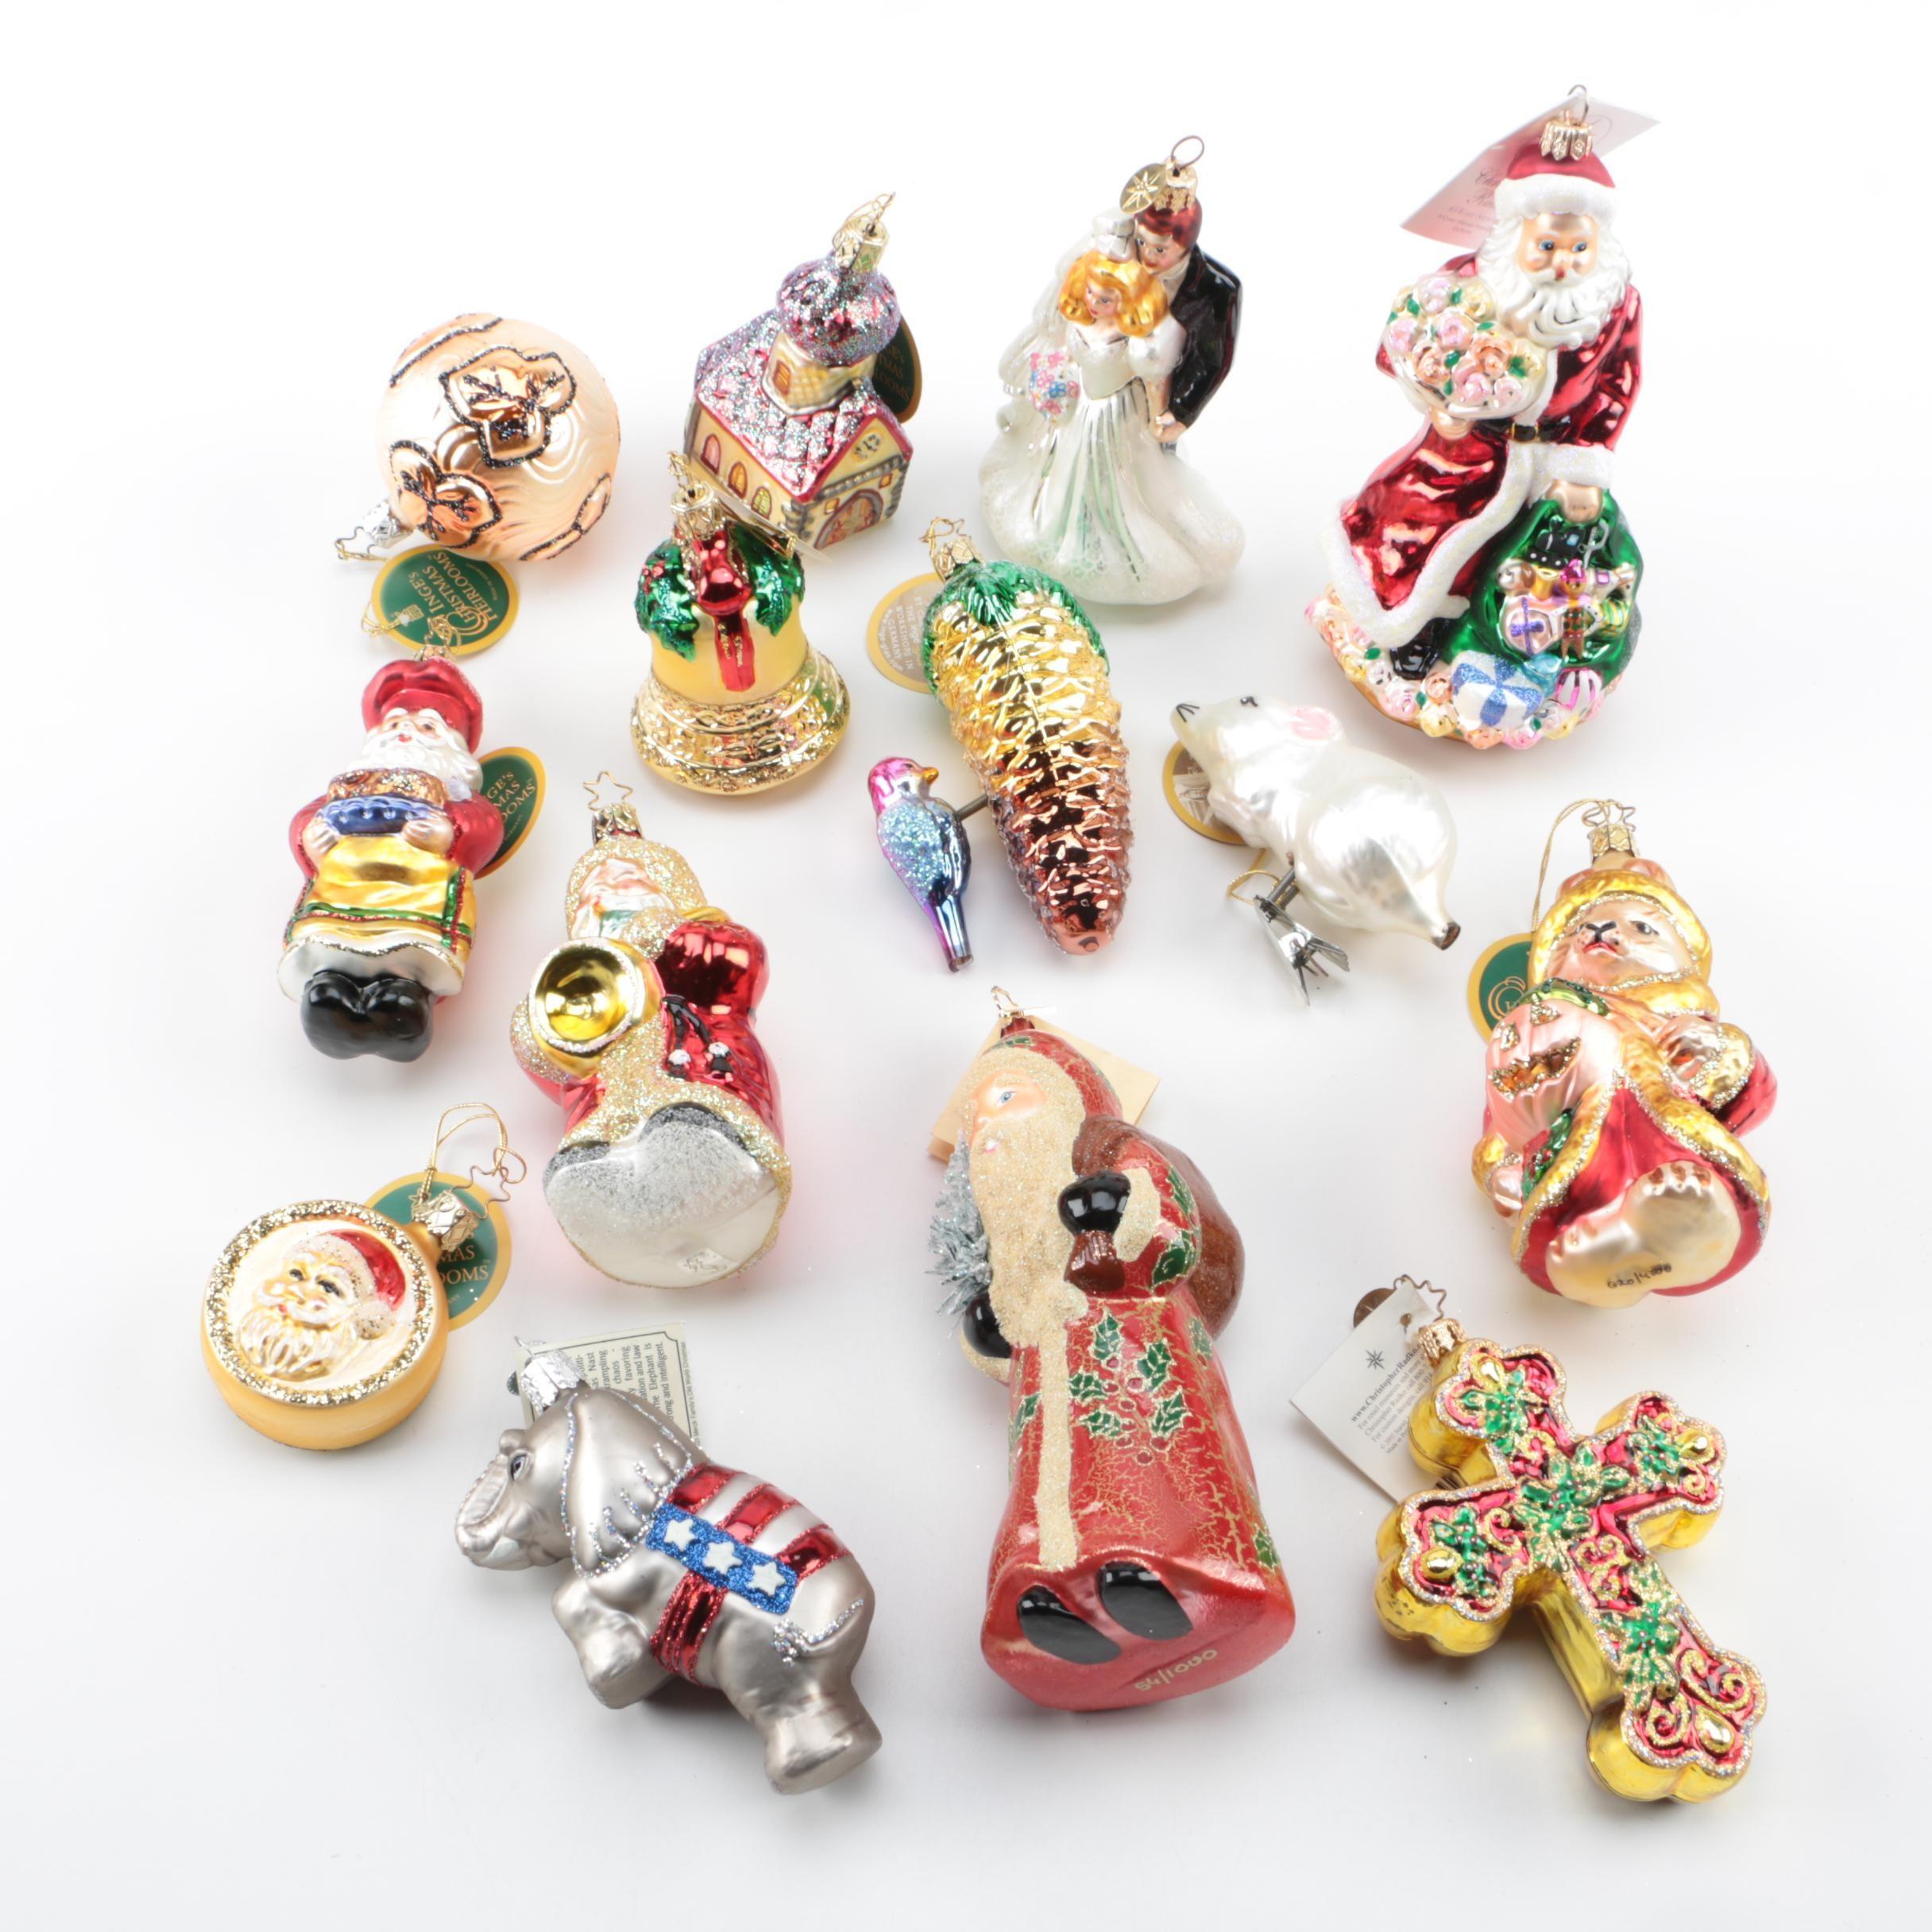 Assorted Christmas Ornaments including Christopher Radko